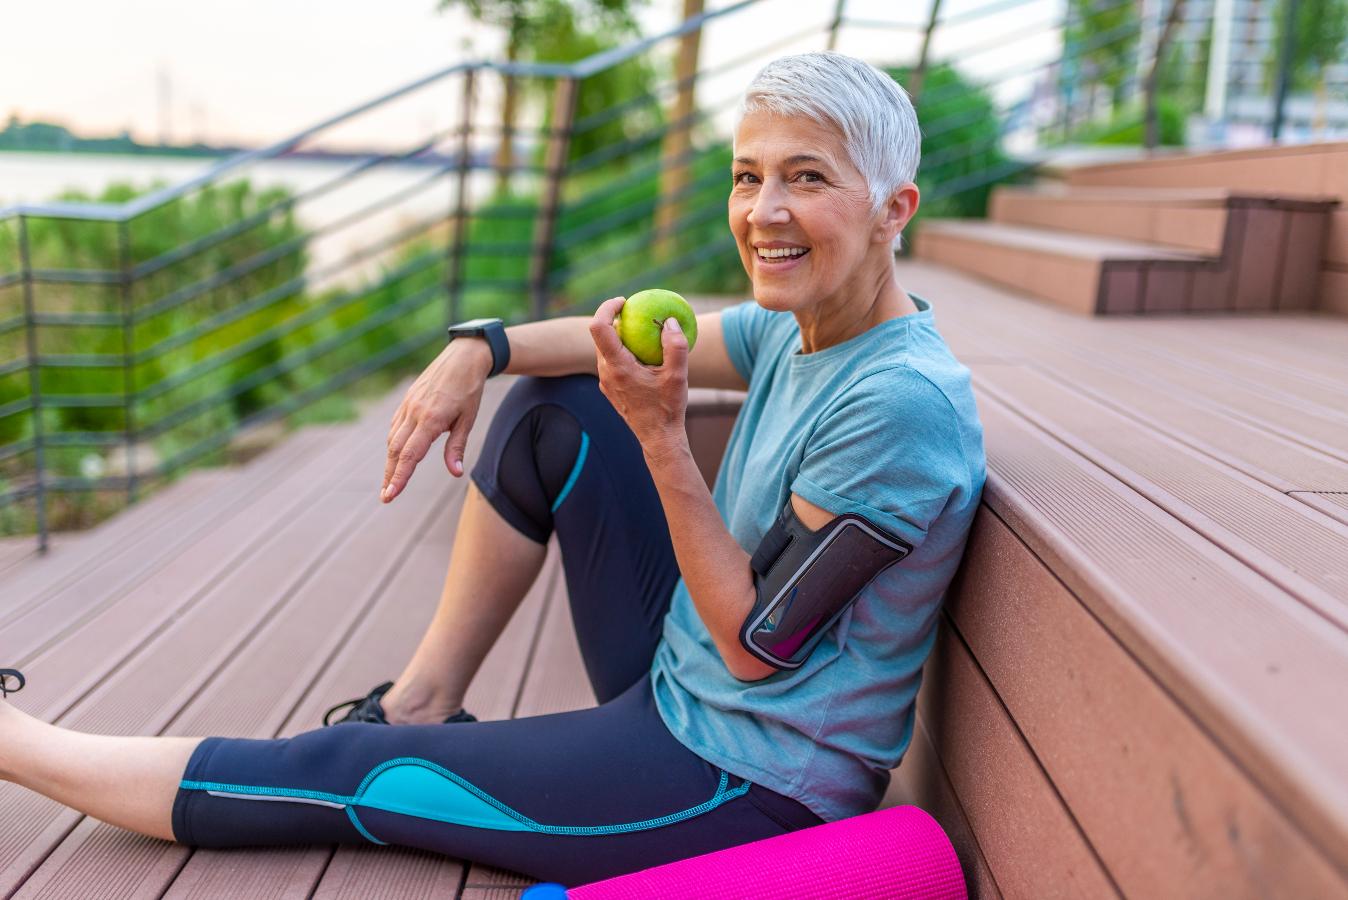 healthy mature aged women enjoying apple BodyViva